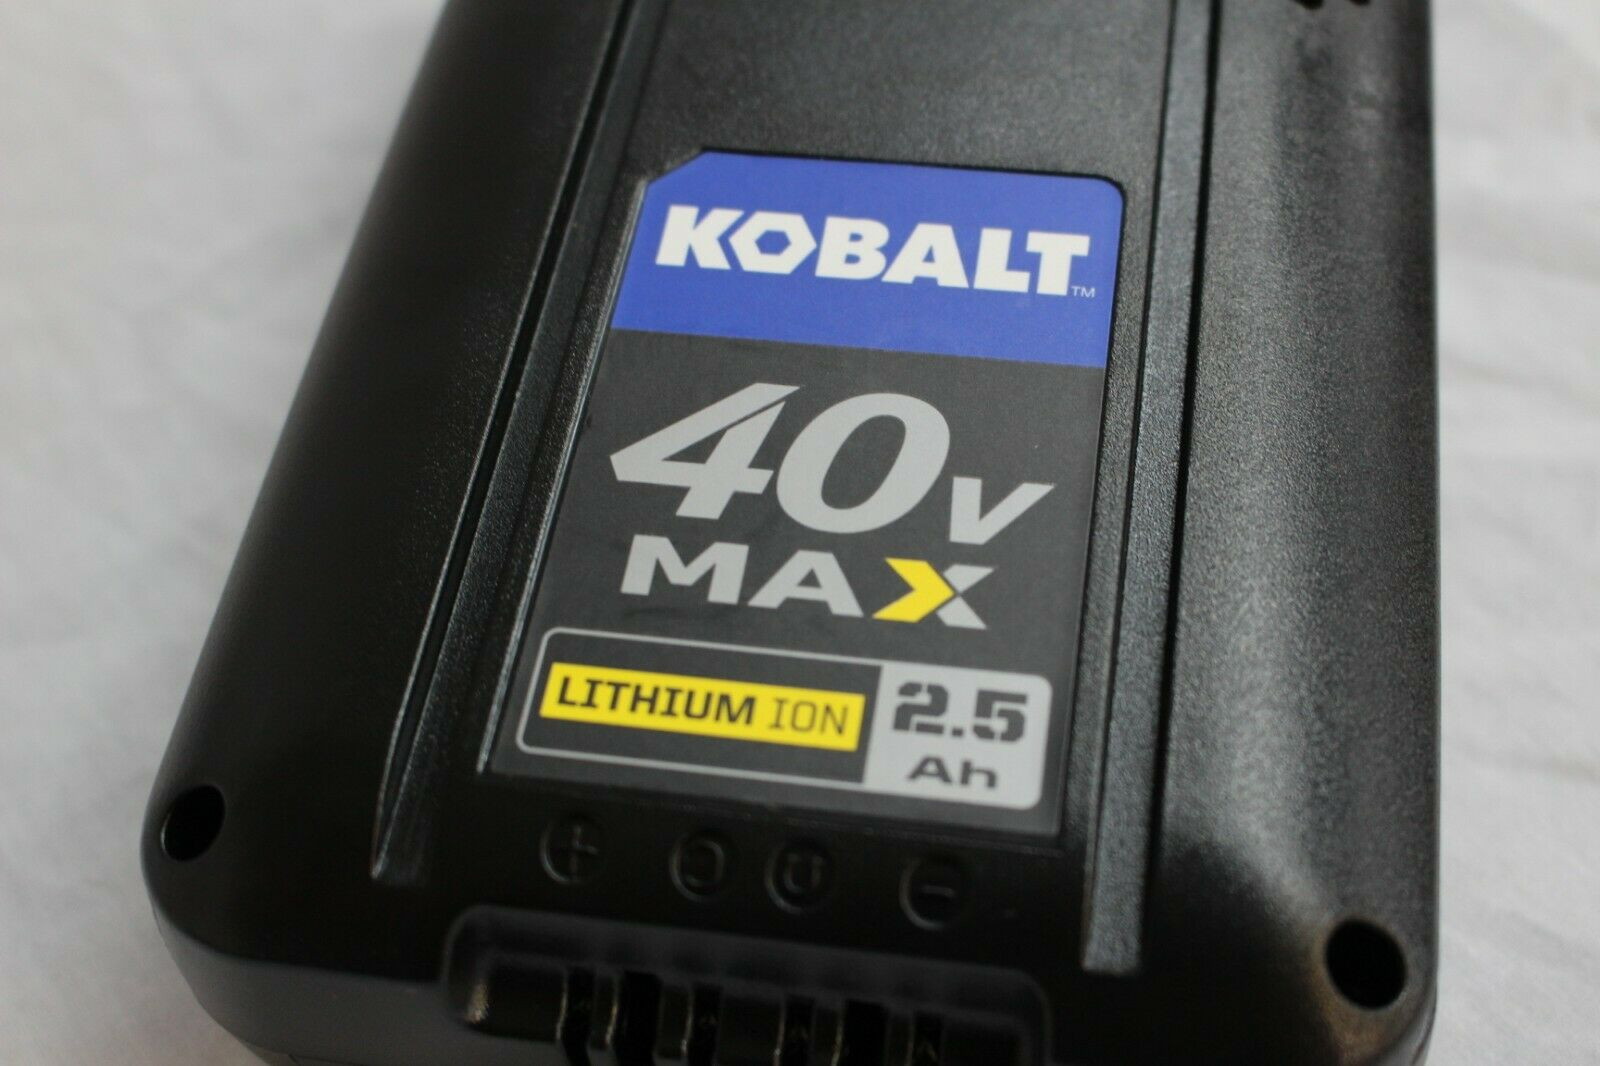 KOBALT MAX 40 VOLT 2.5AH BATTERY KB 245-06 LITHIUM ION